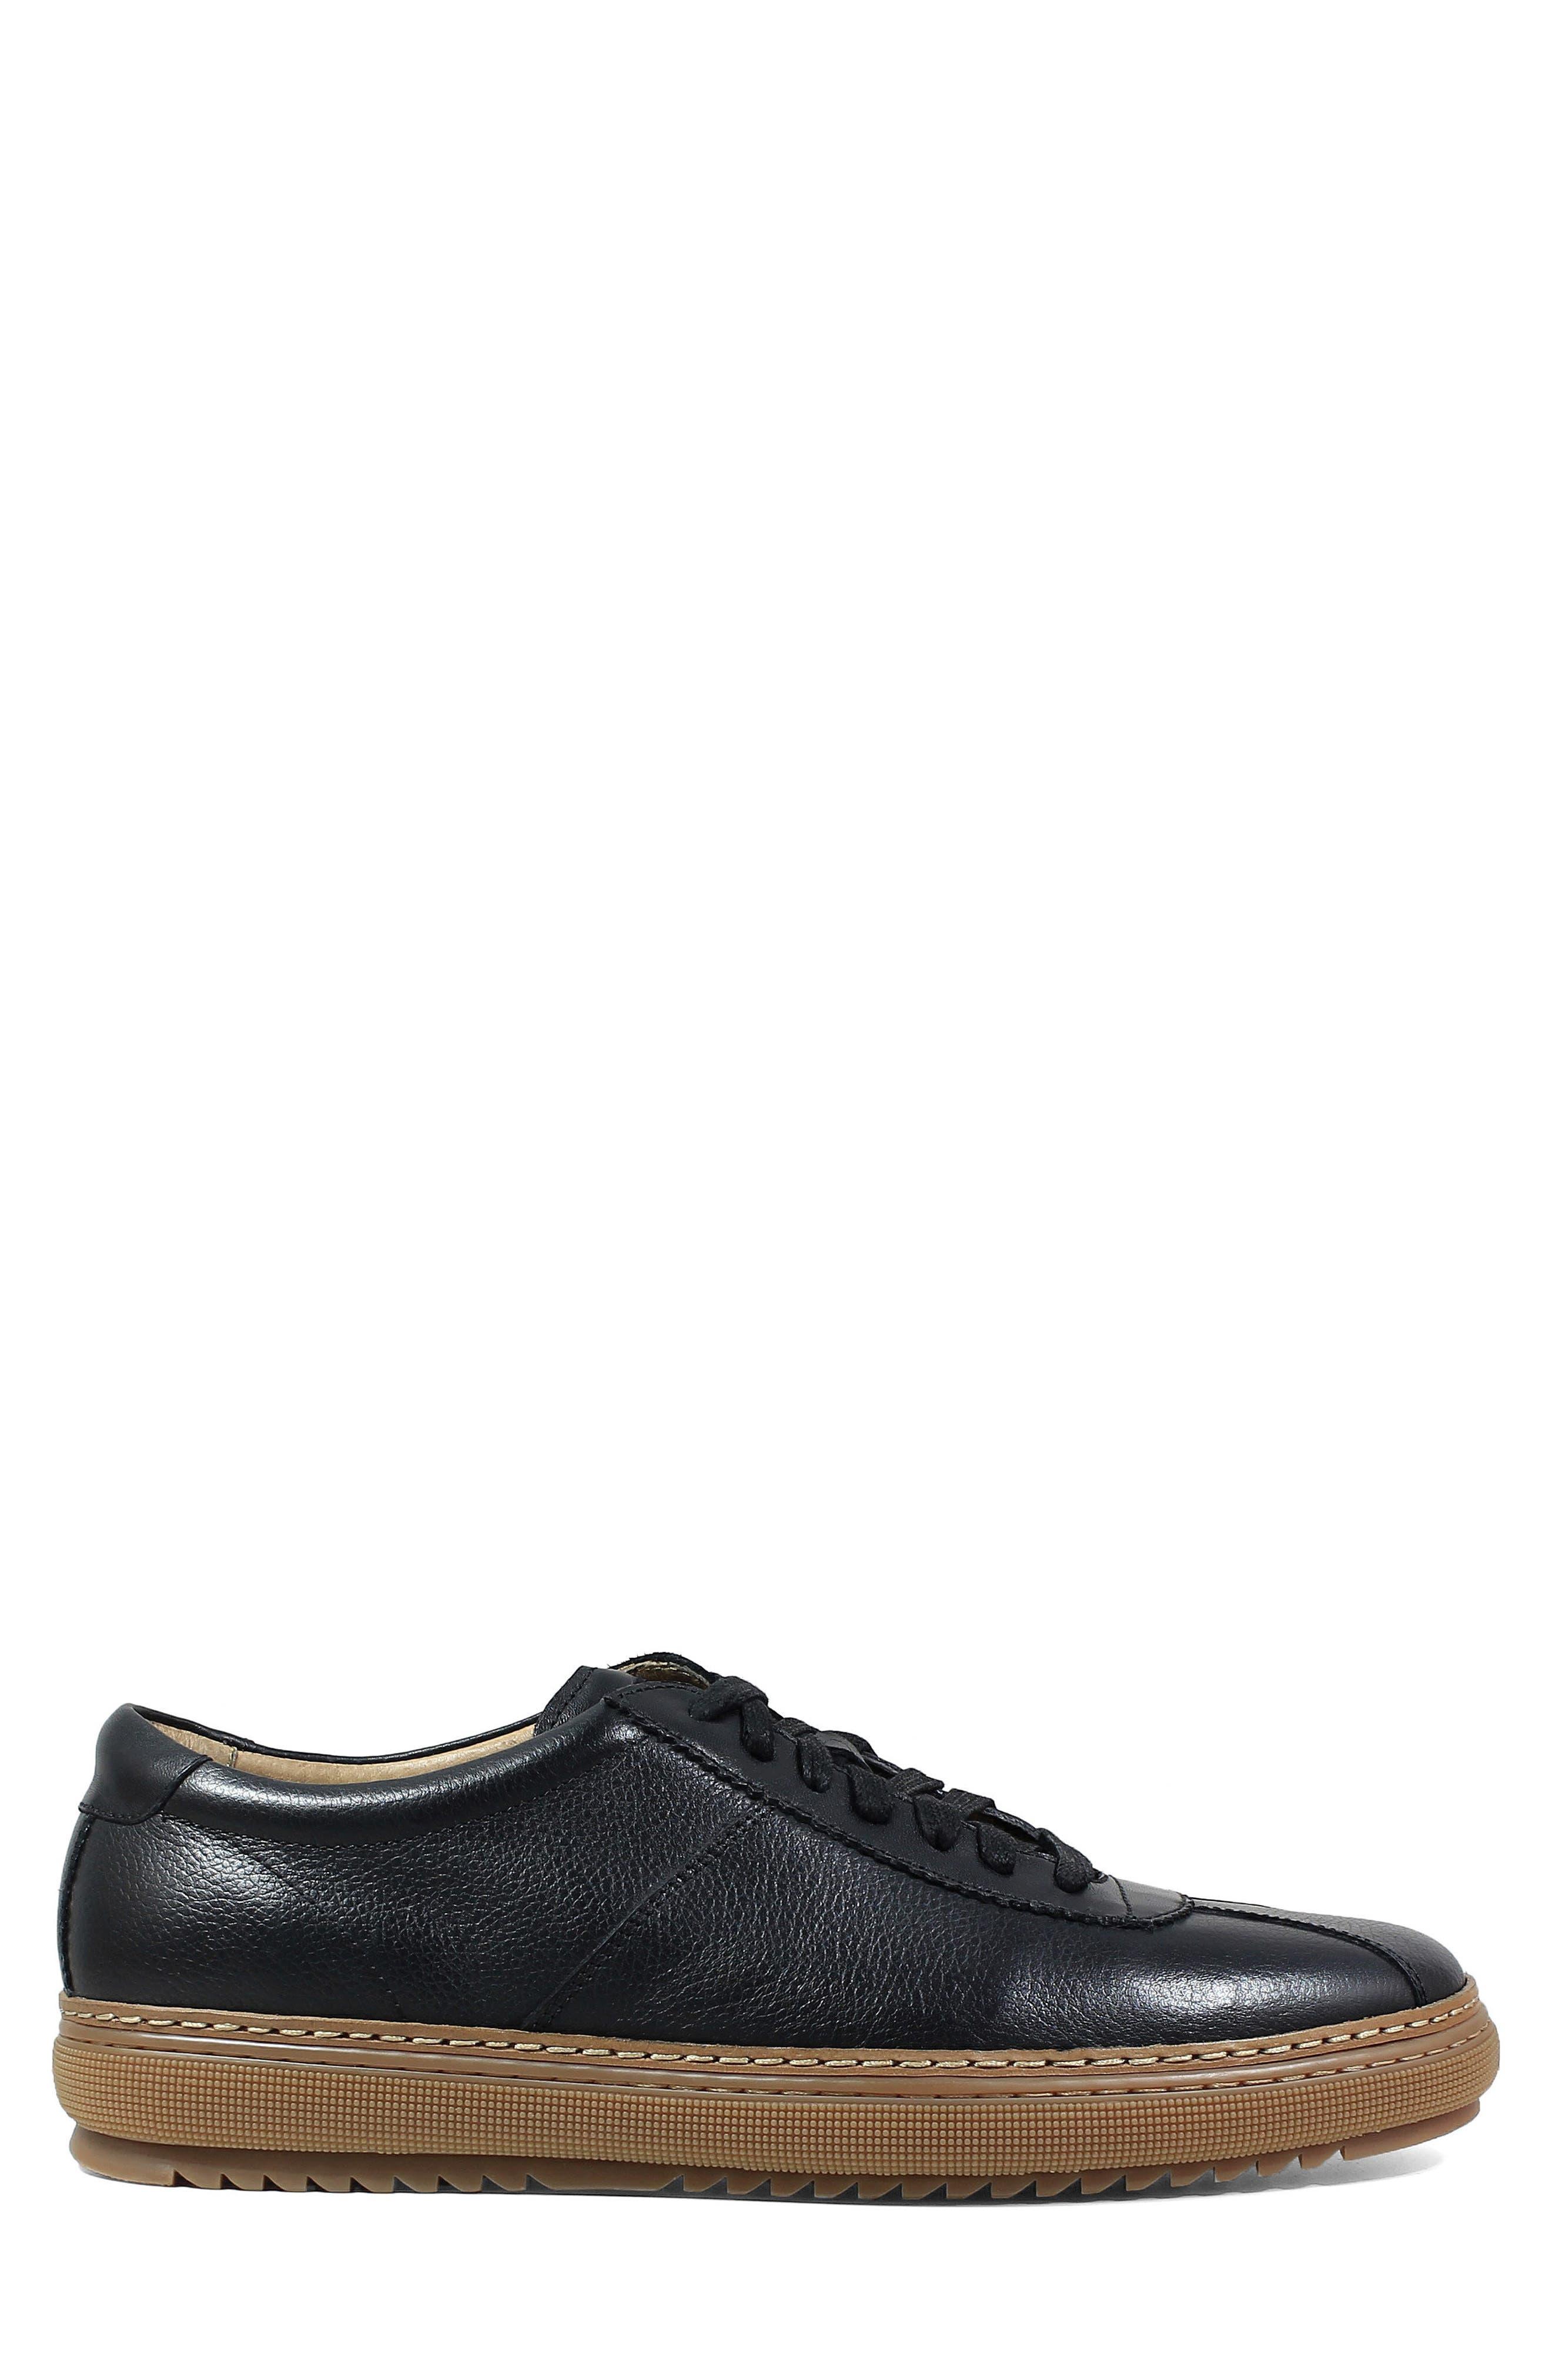 Crew Sneaker,                             Alternate thumbnail 3, color,                             001